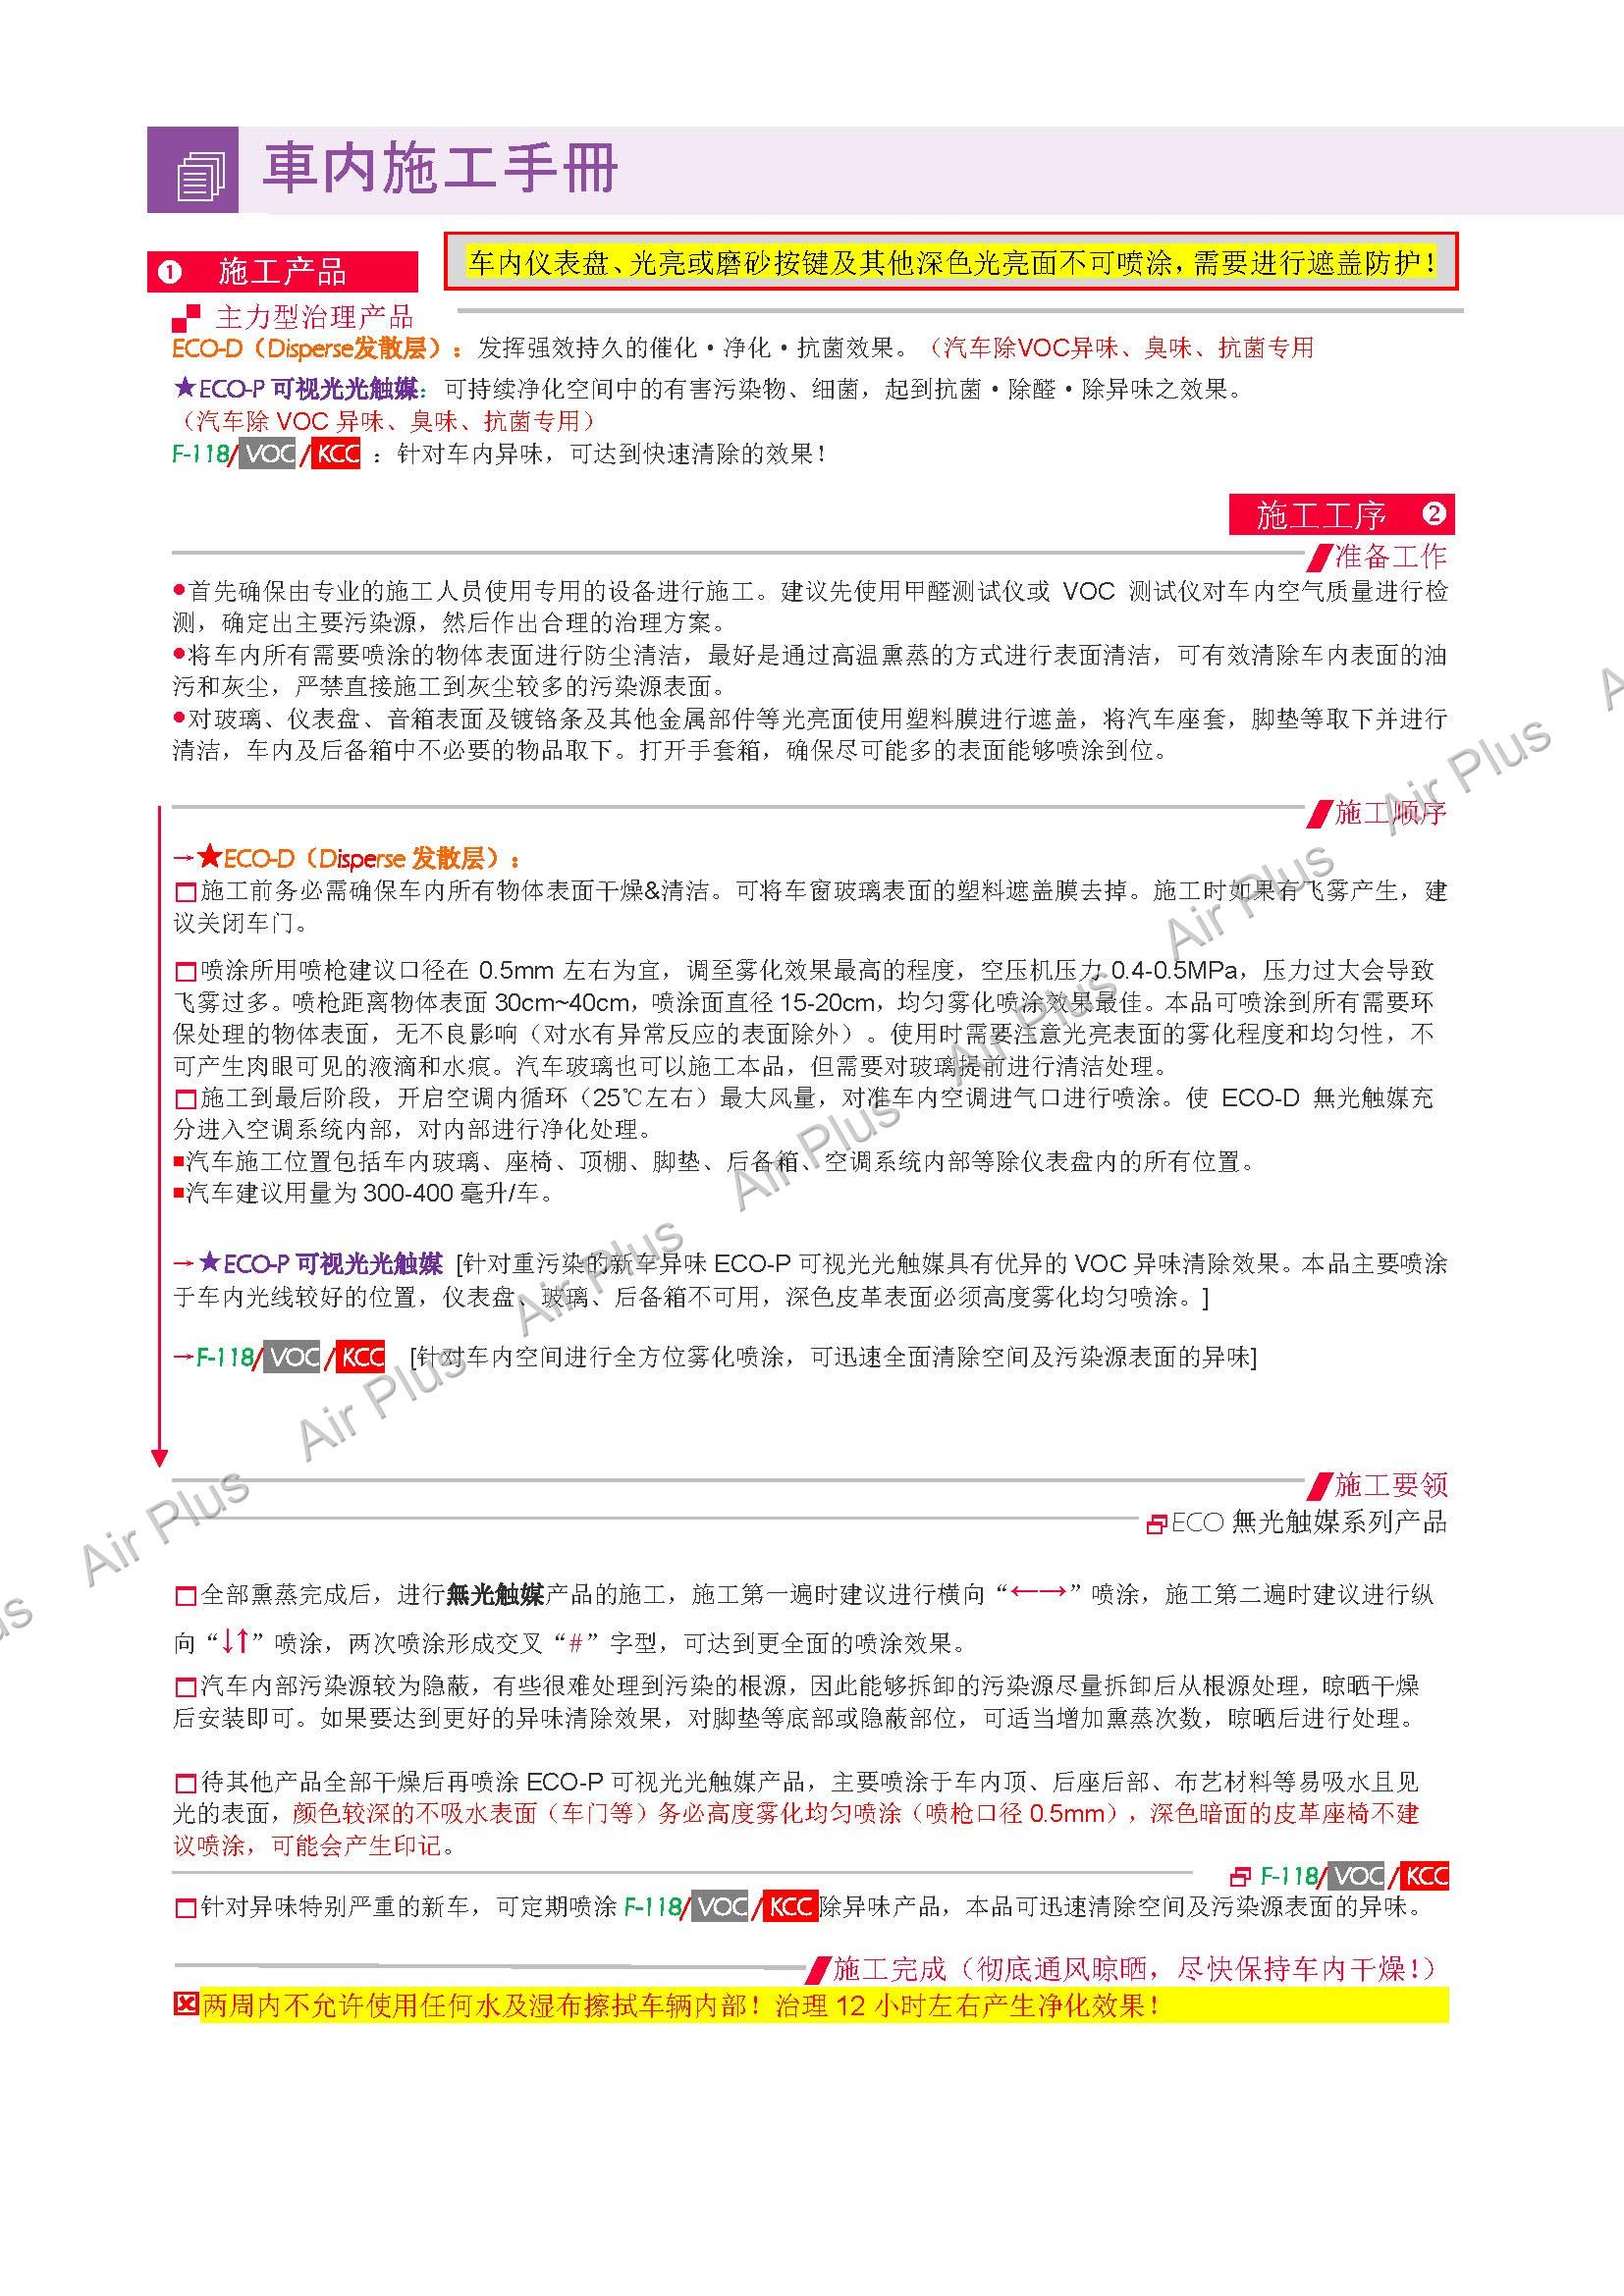 ★JP-ECO日本淨化製品-施工手册_页面_22.jpg